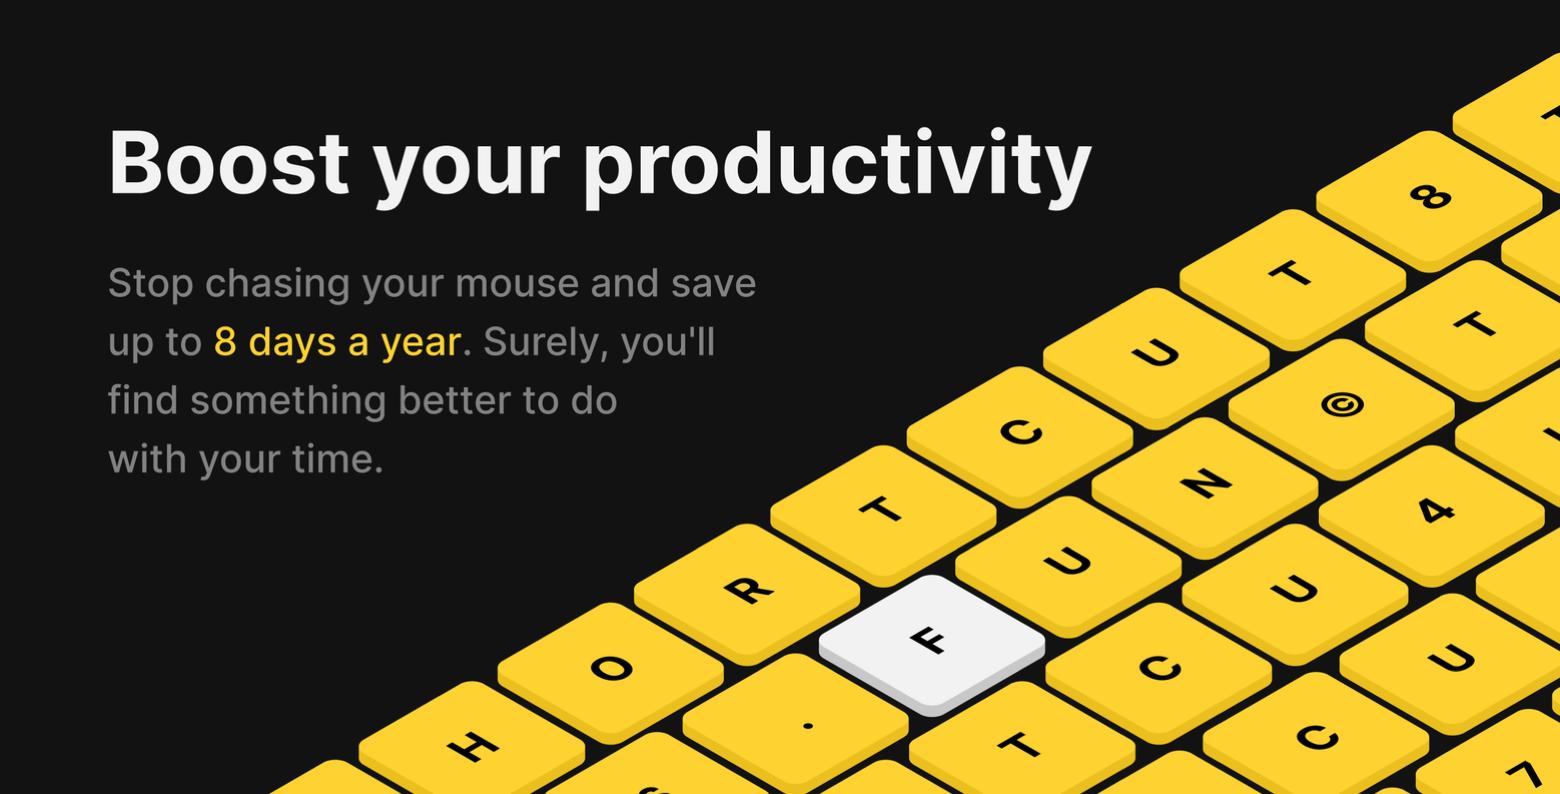 Mouseless keyboard shortcuts